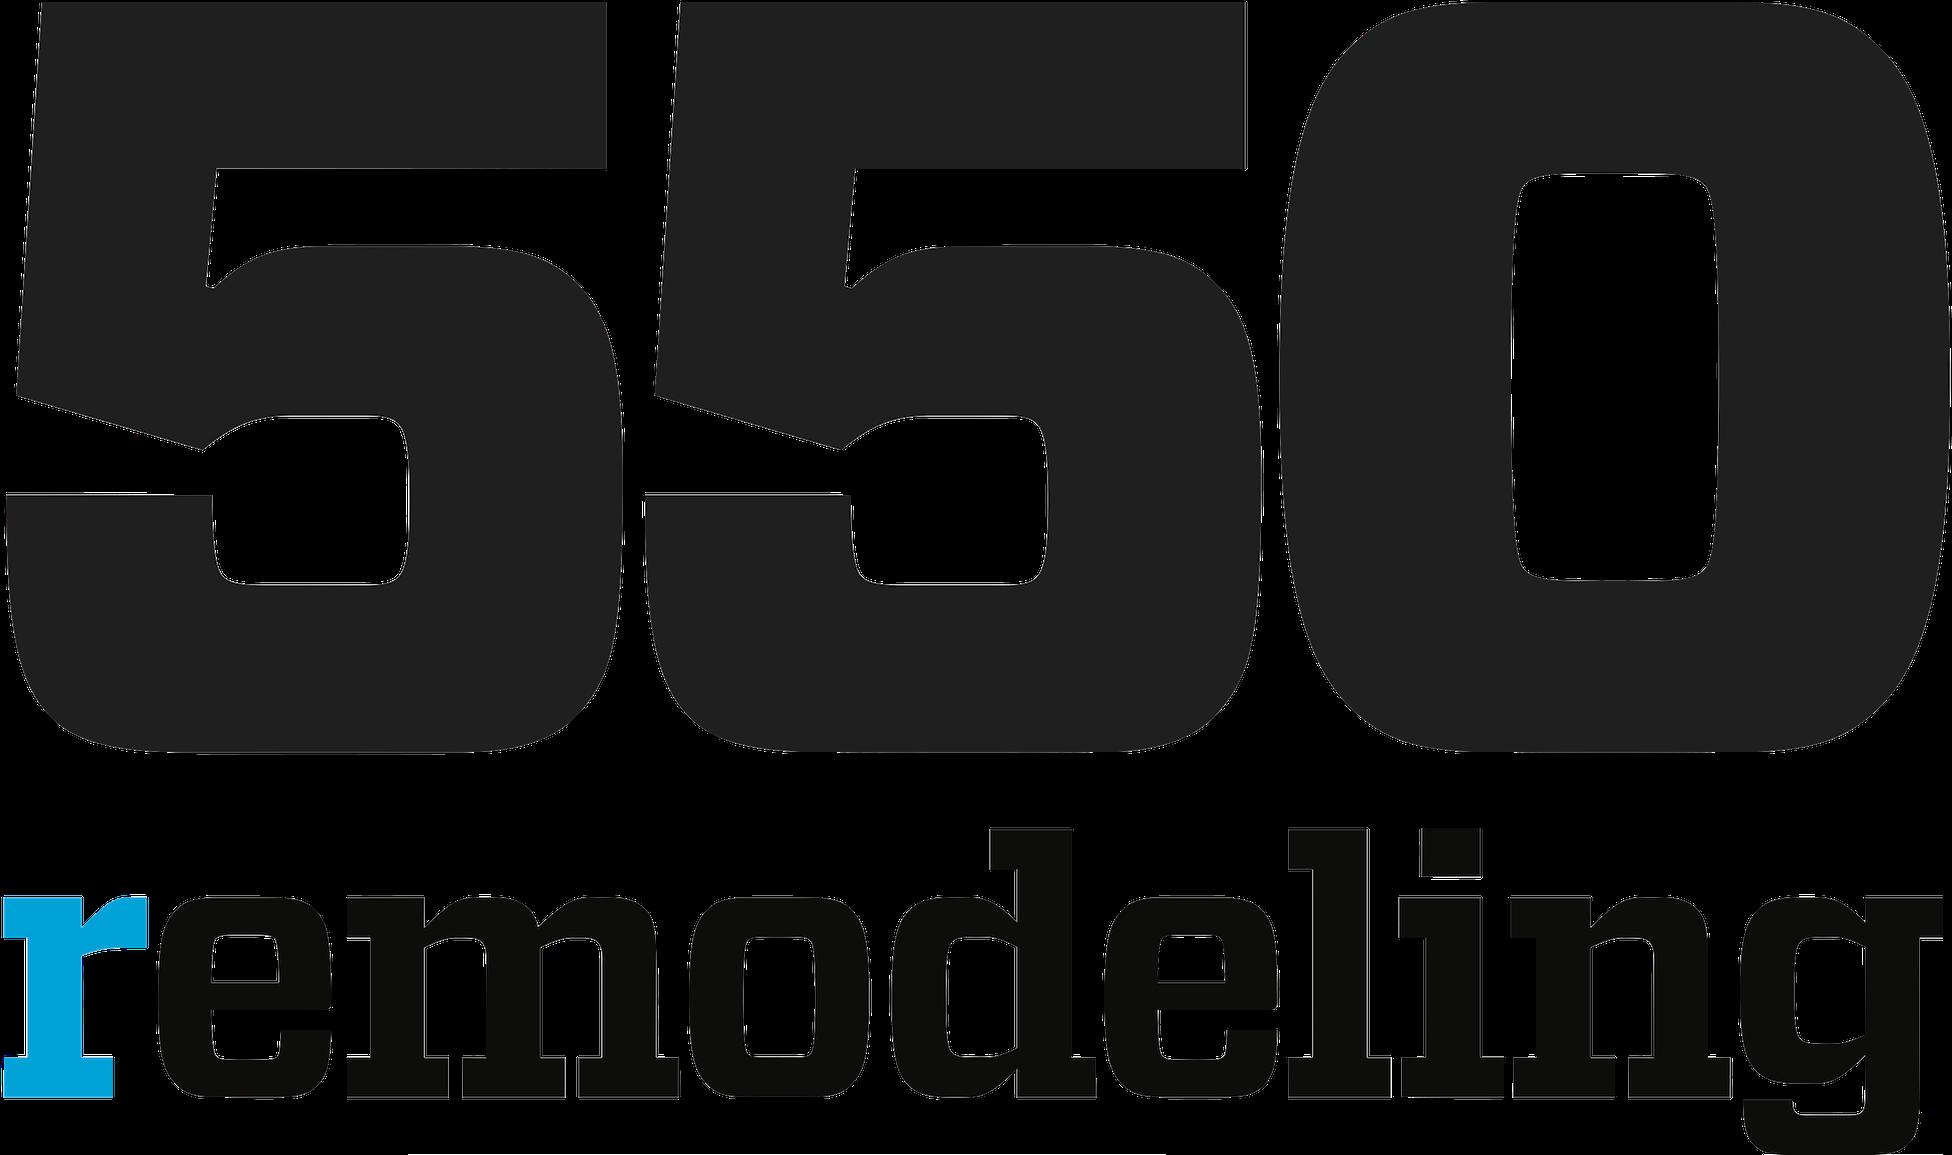 Remodeling 550 logo